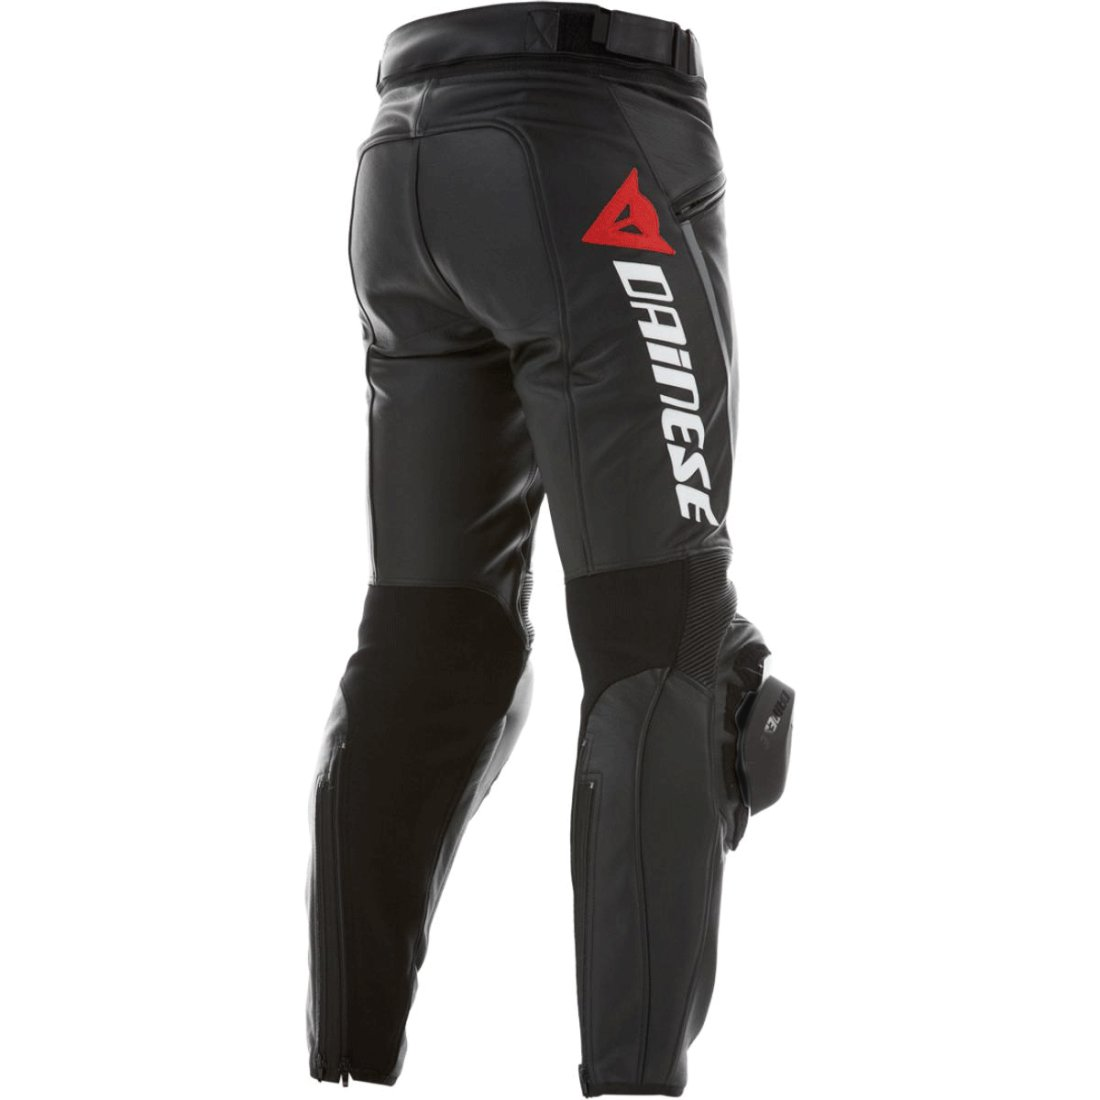 pantalon dainese delta pro c2 black motocard. Black Bedroom Furniture Sets. Home Design Ideas